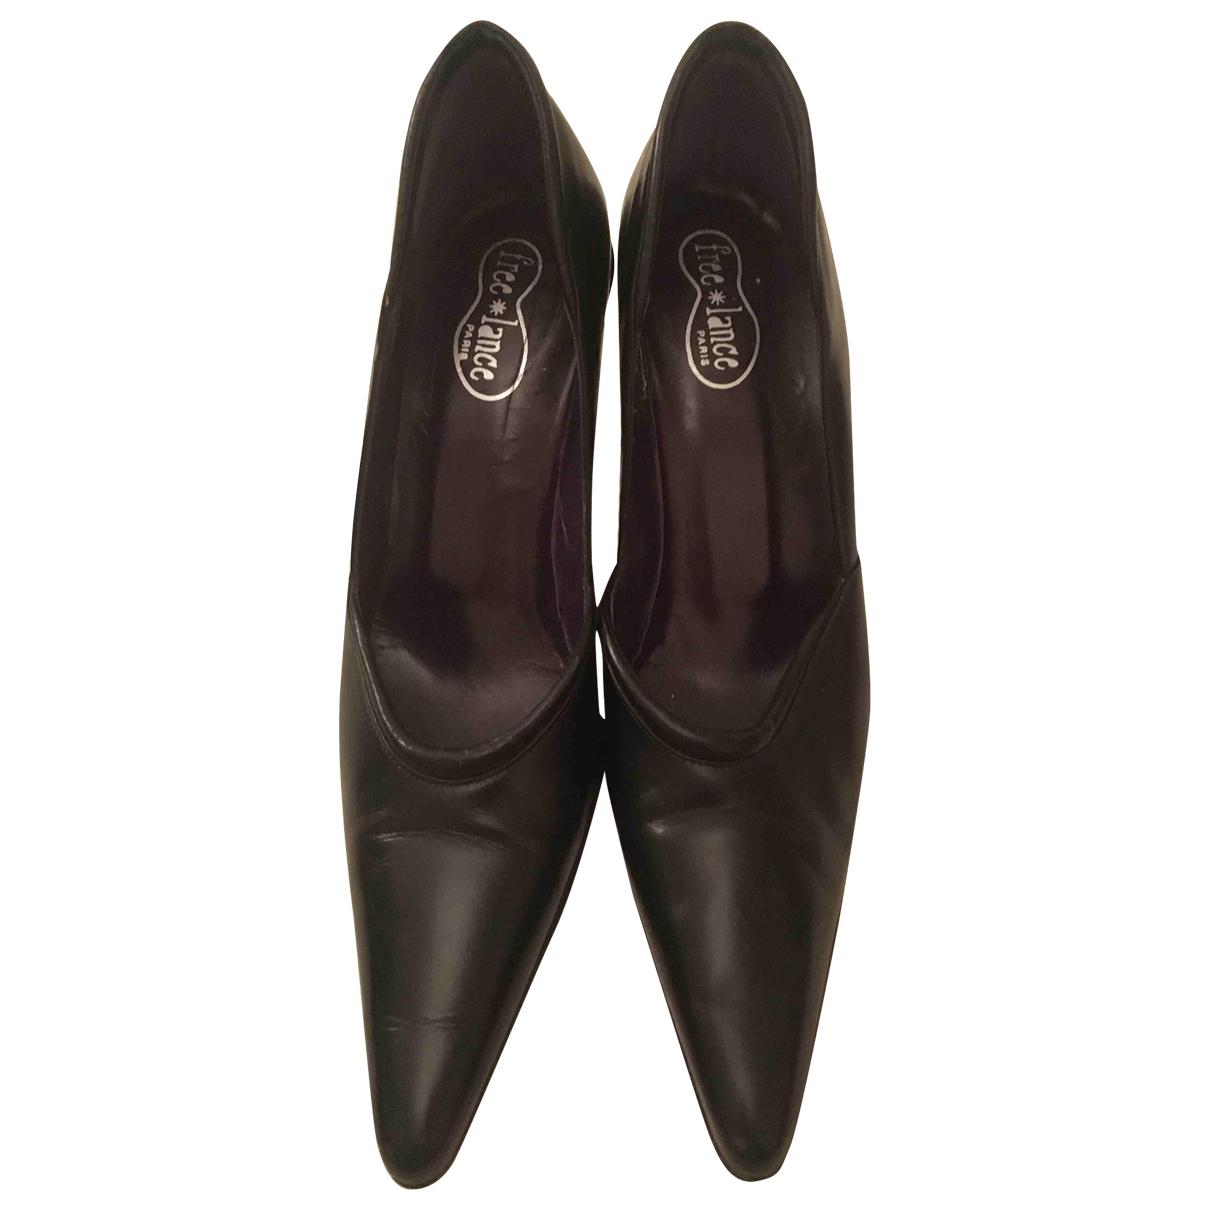 Free Lance \N Black Leather Heels for Women 39 EU